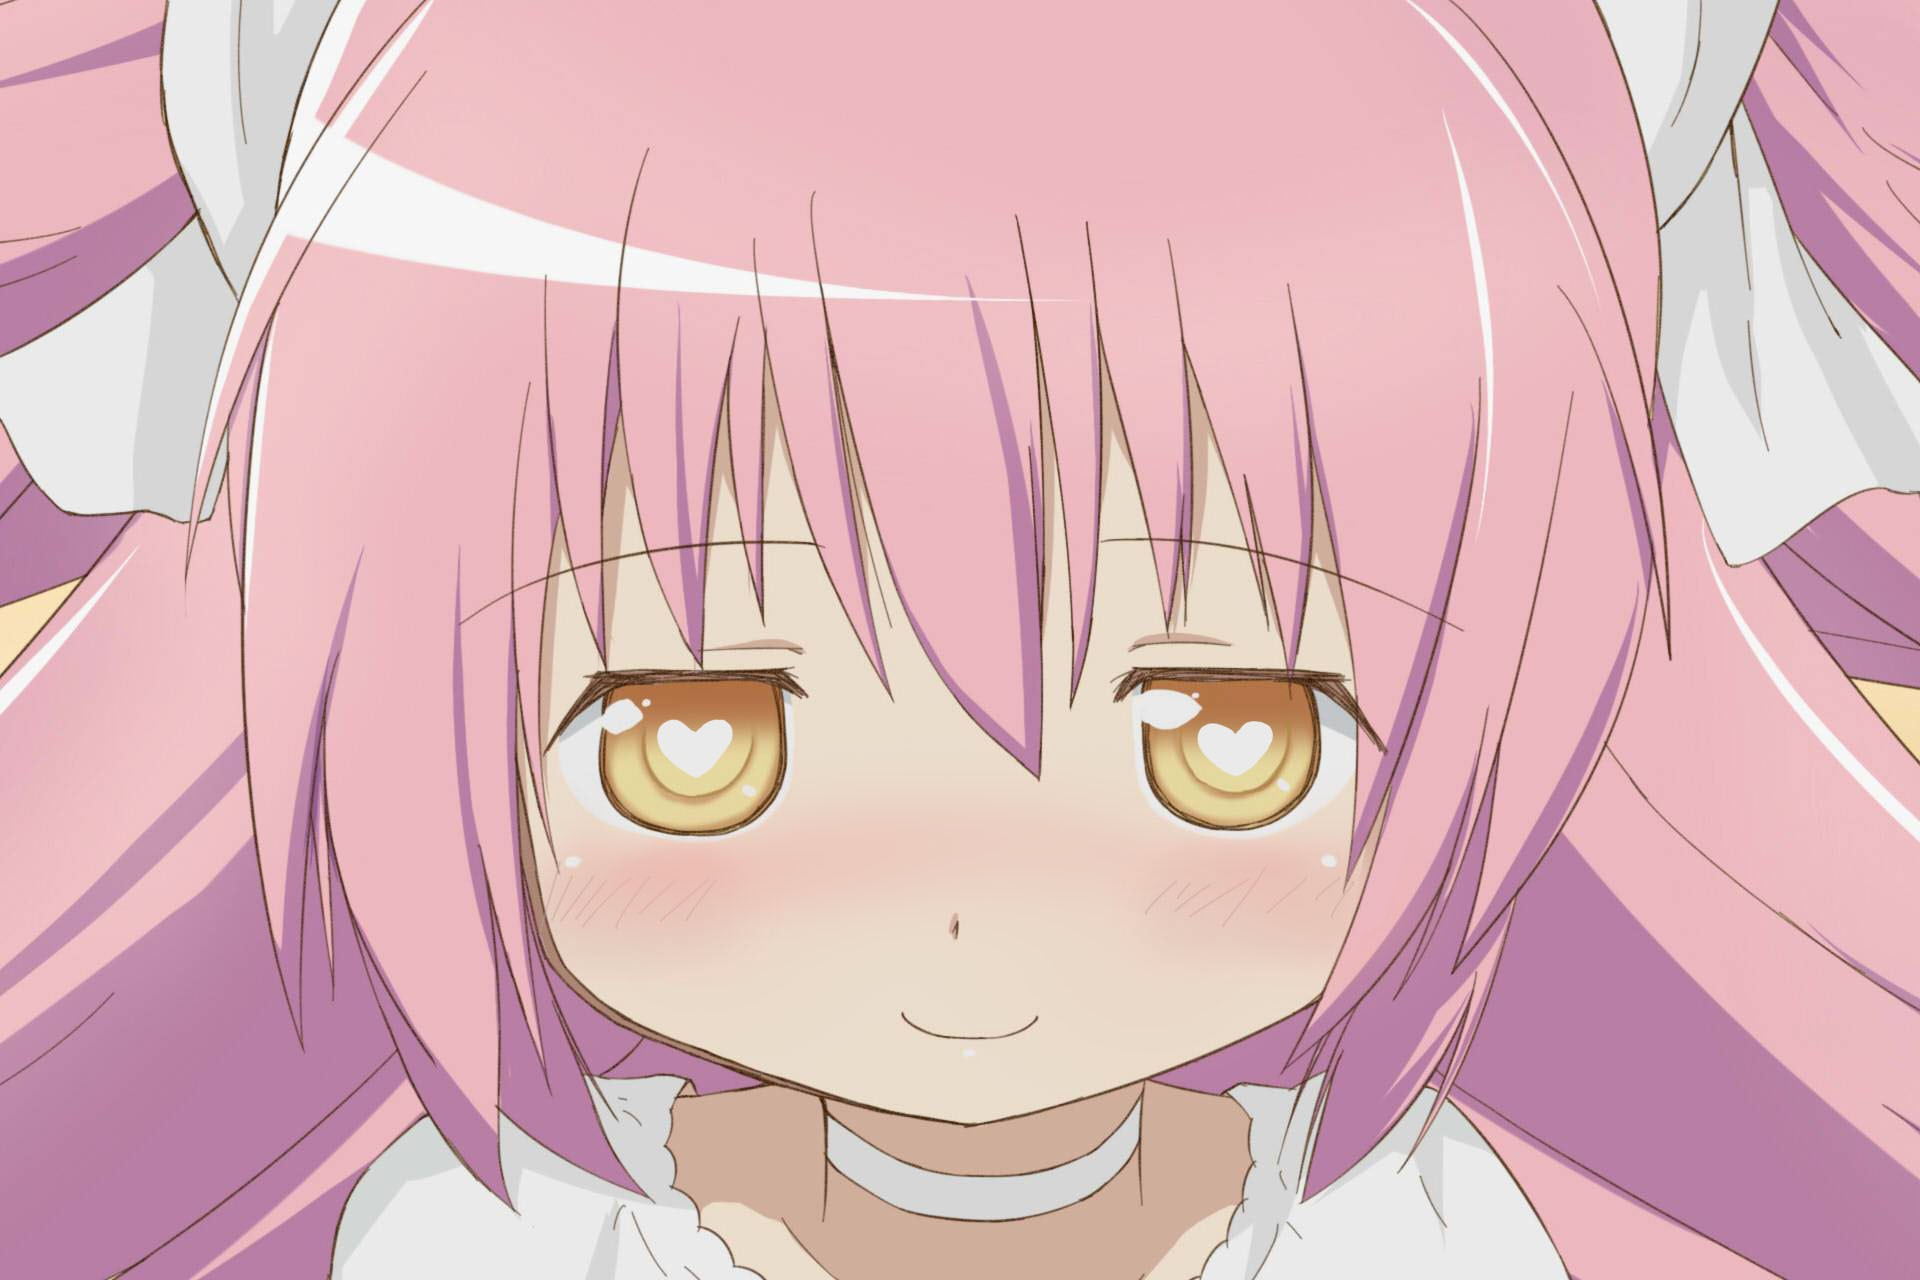 mahou shoujo madoka magica kaname madoka anime anime girls